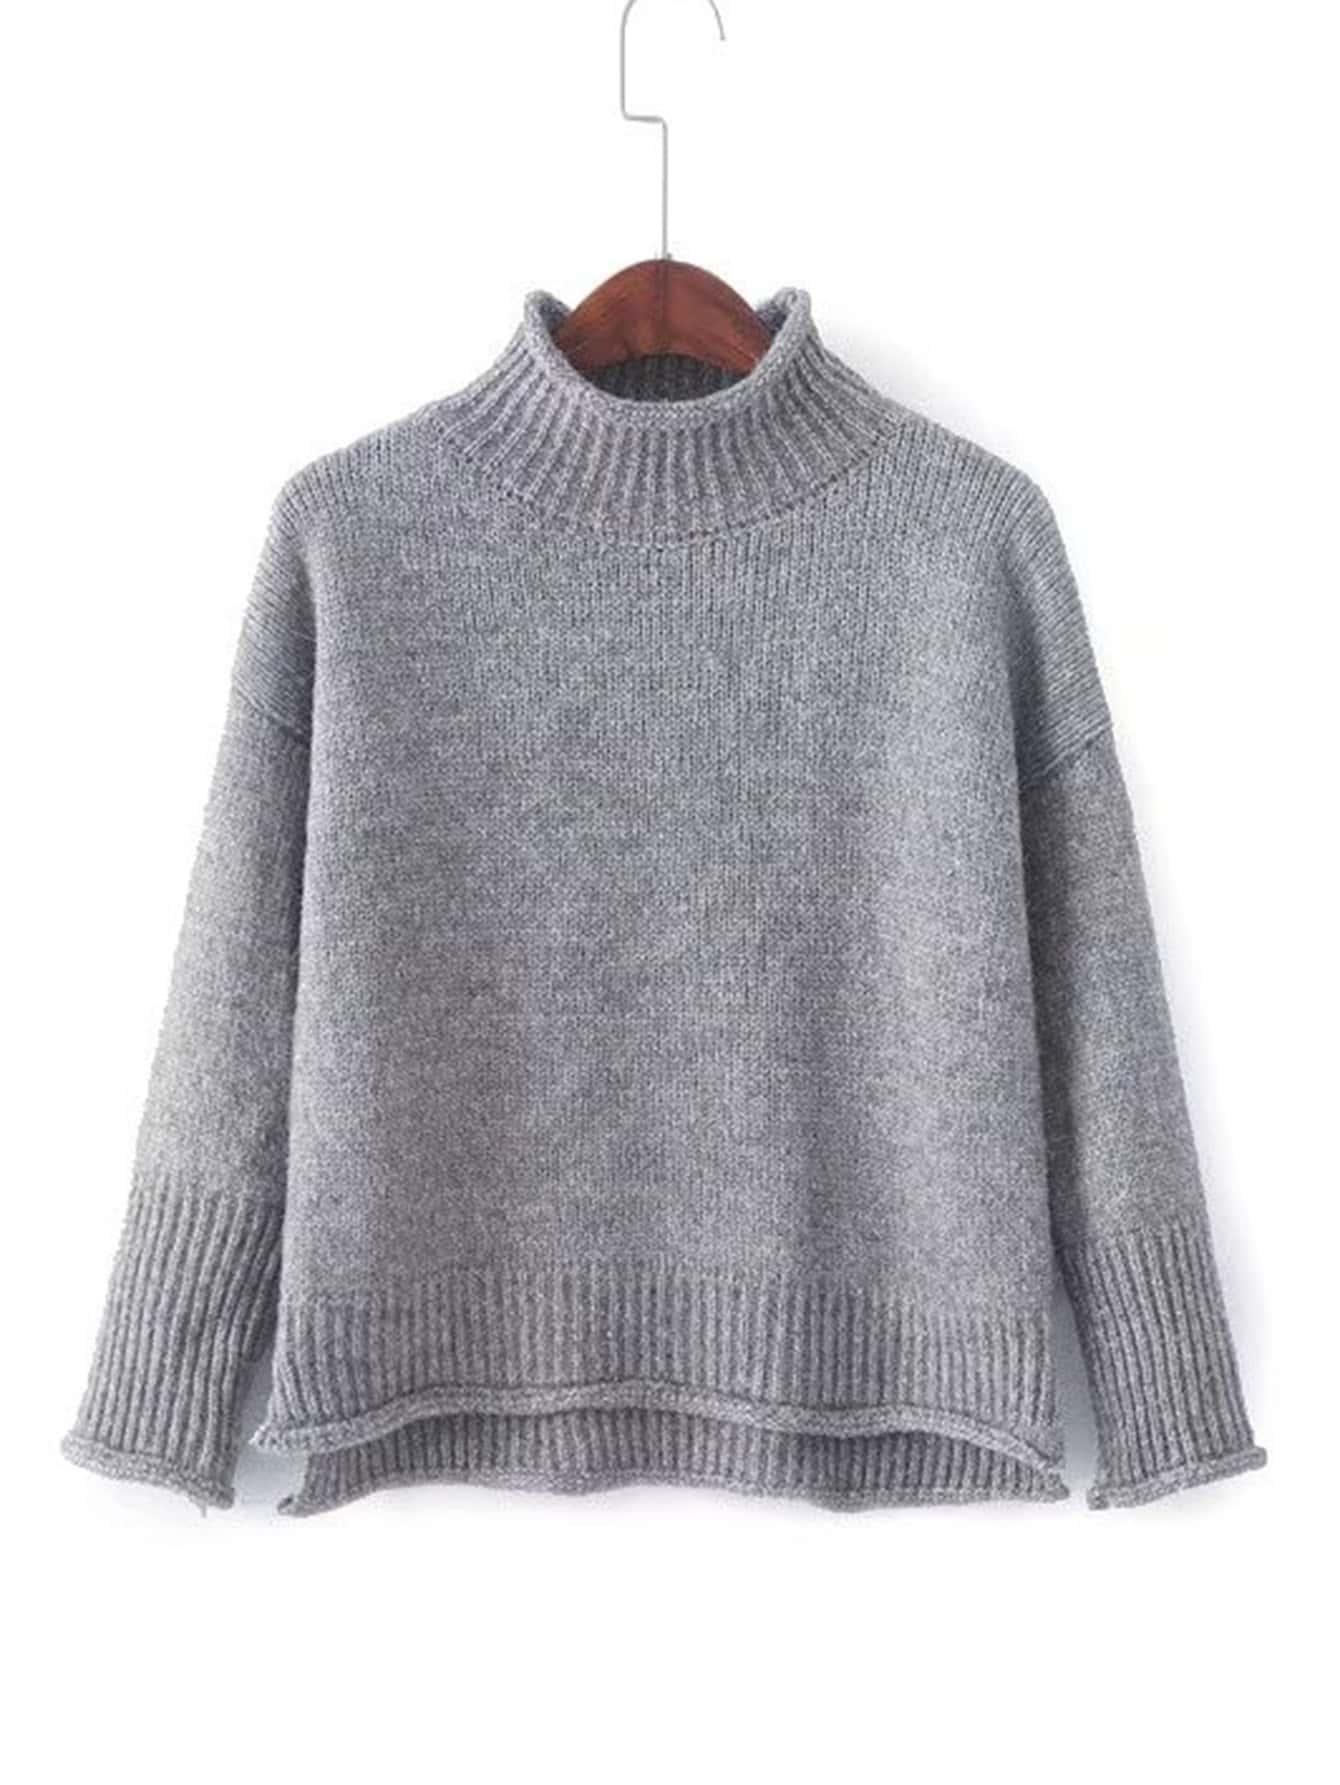 Rib Trim Rolled Sweater sweater171101204